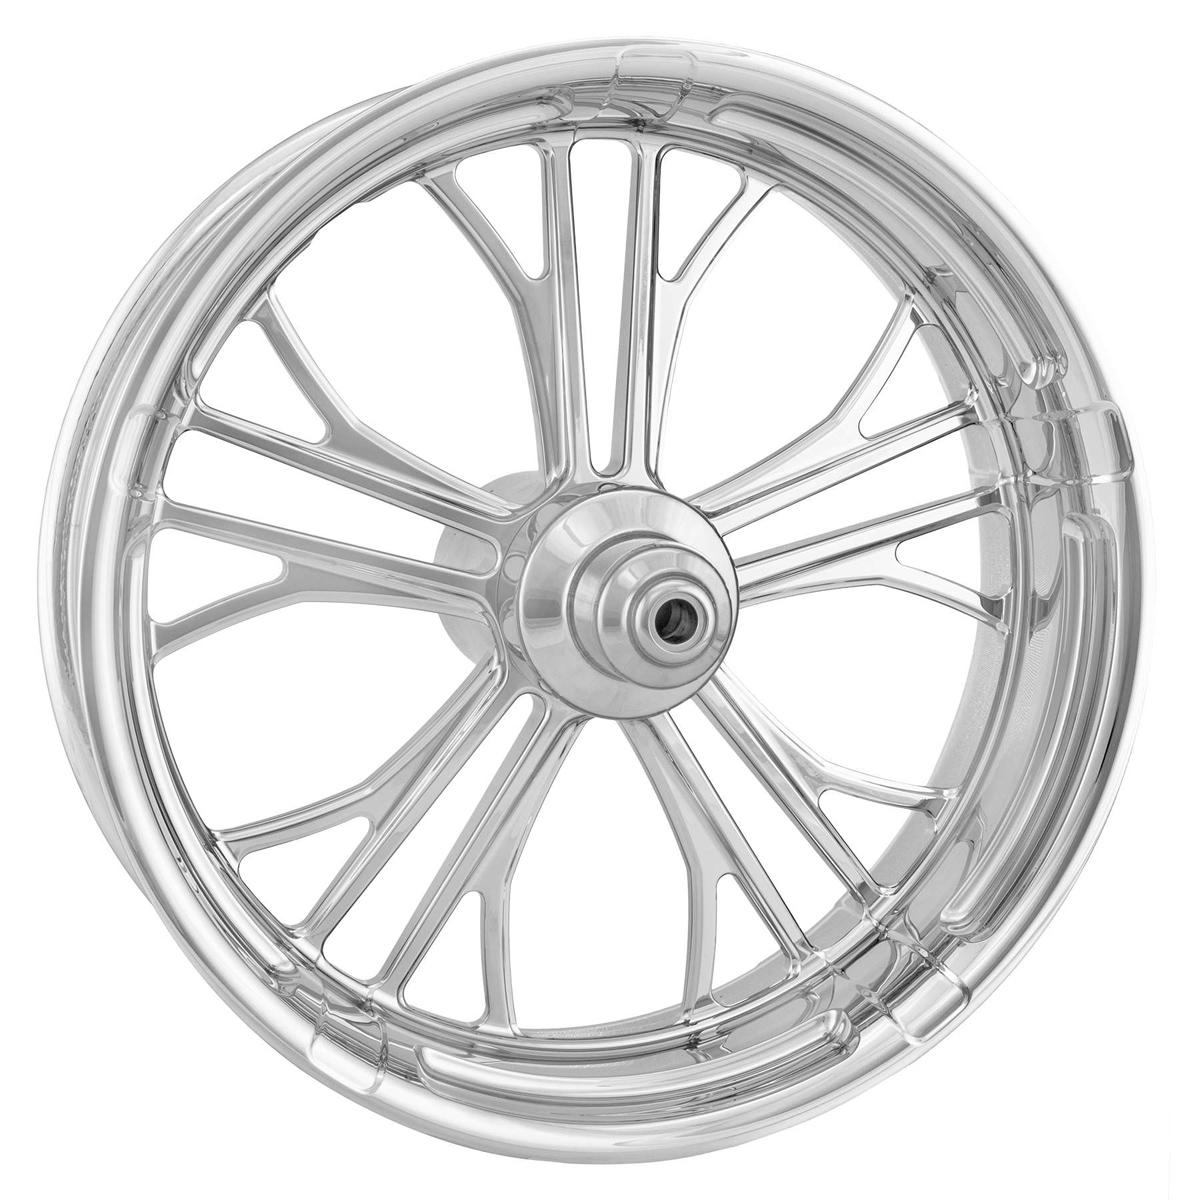 Performance Machine Dixon Chrome Front Wheel 23x3.5 ABS